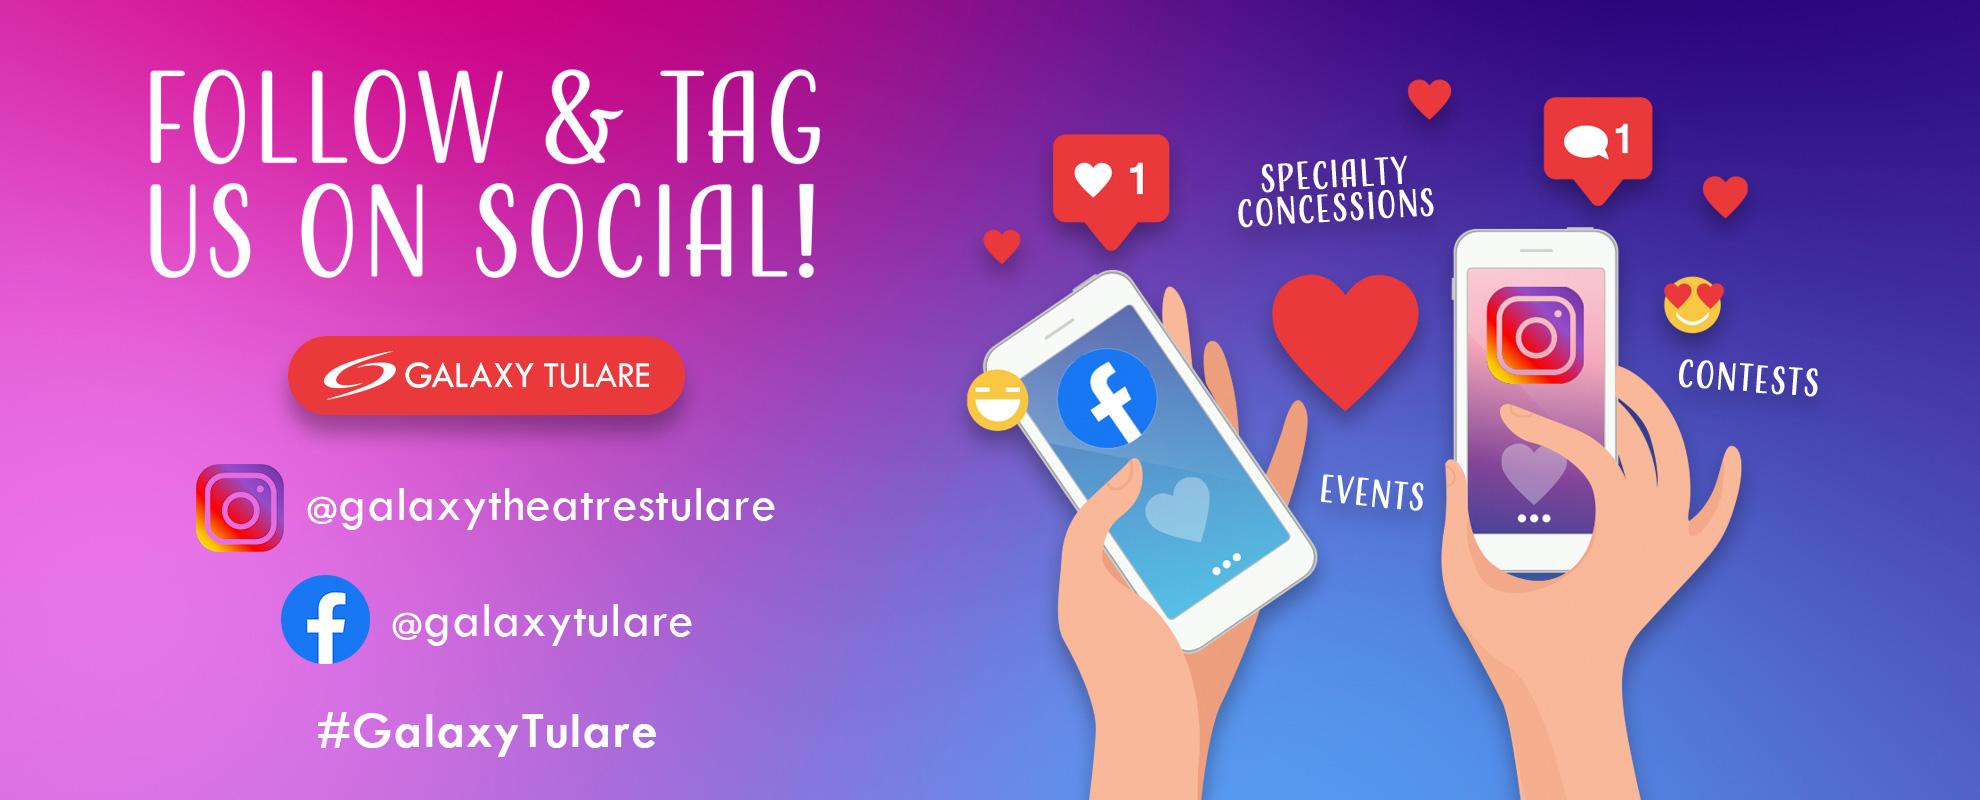 Socials/Hashtag - Tulare image